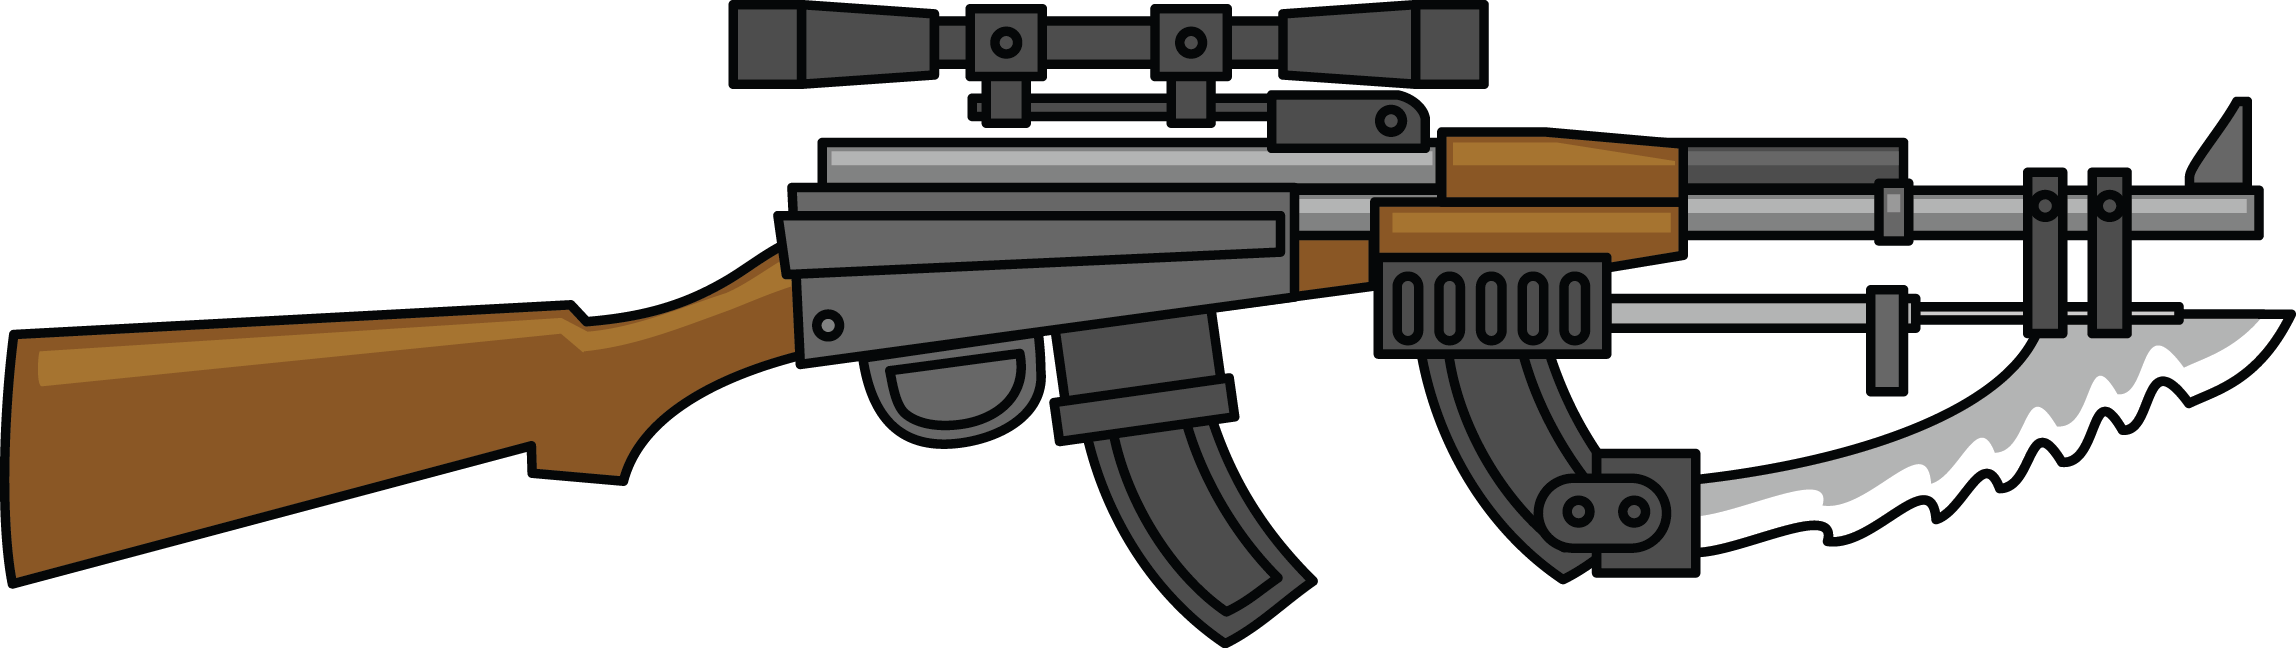 clip art transparent stock Cartoon free download best. Army gun clipart.